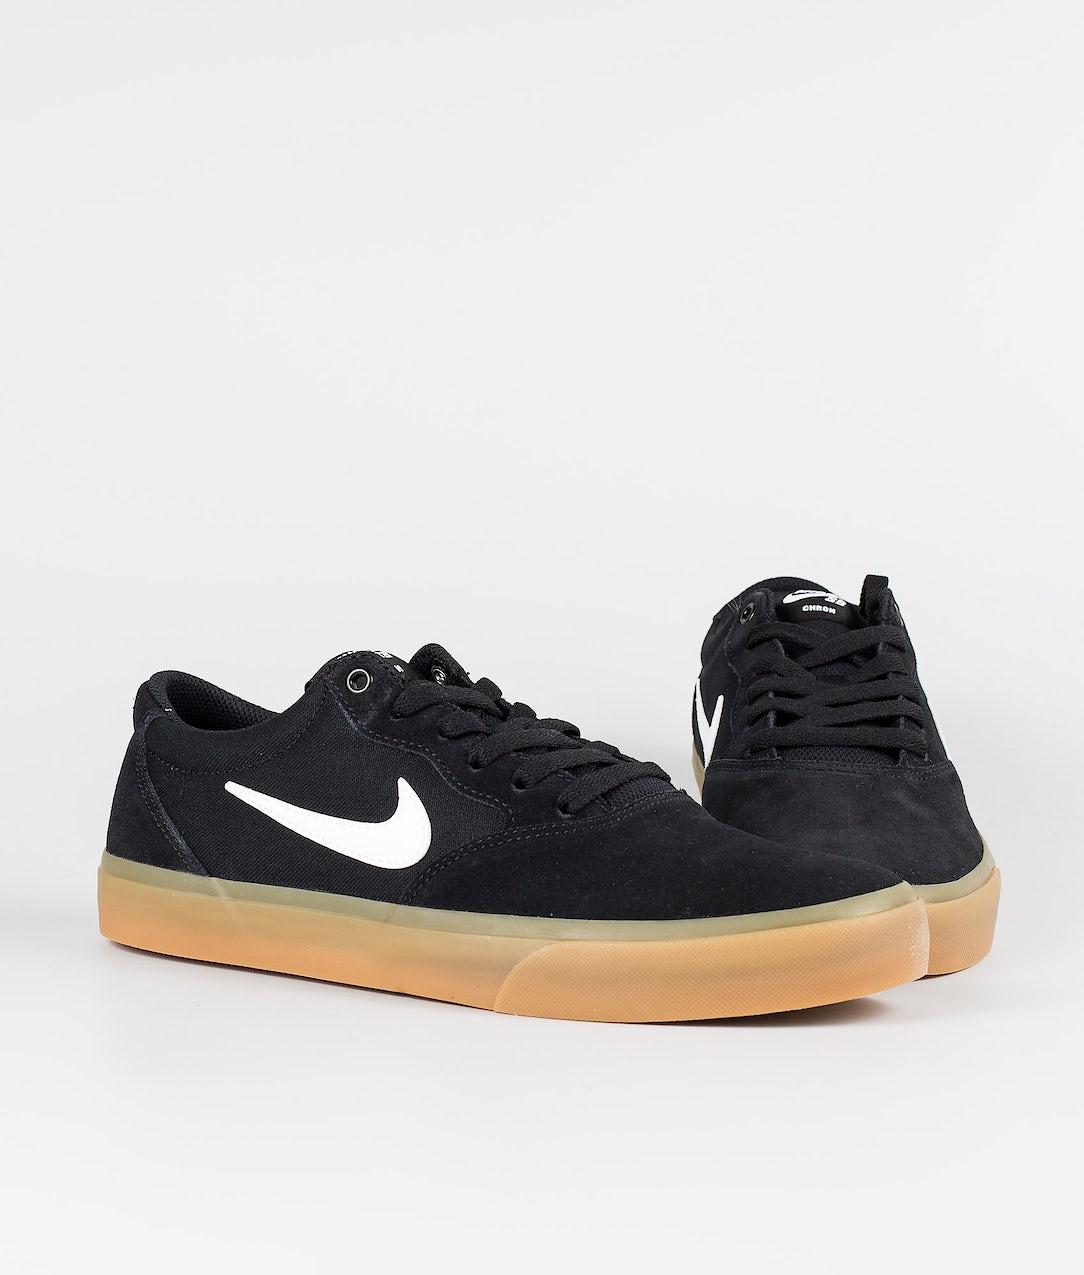 File Dare diritti capire  Nike SB Chron SLR Shoes Black/White-Black-Black - Ridestore.com